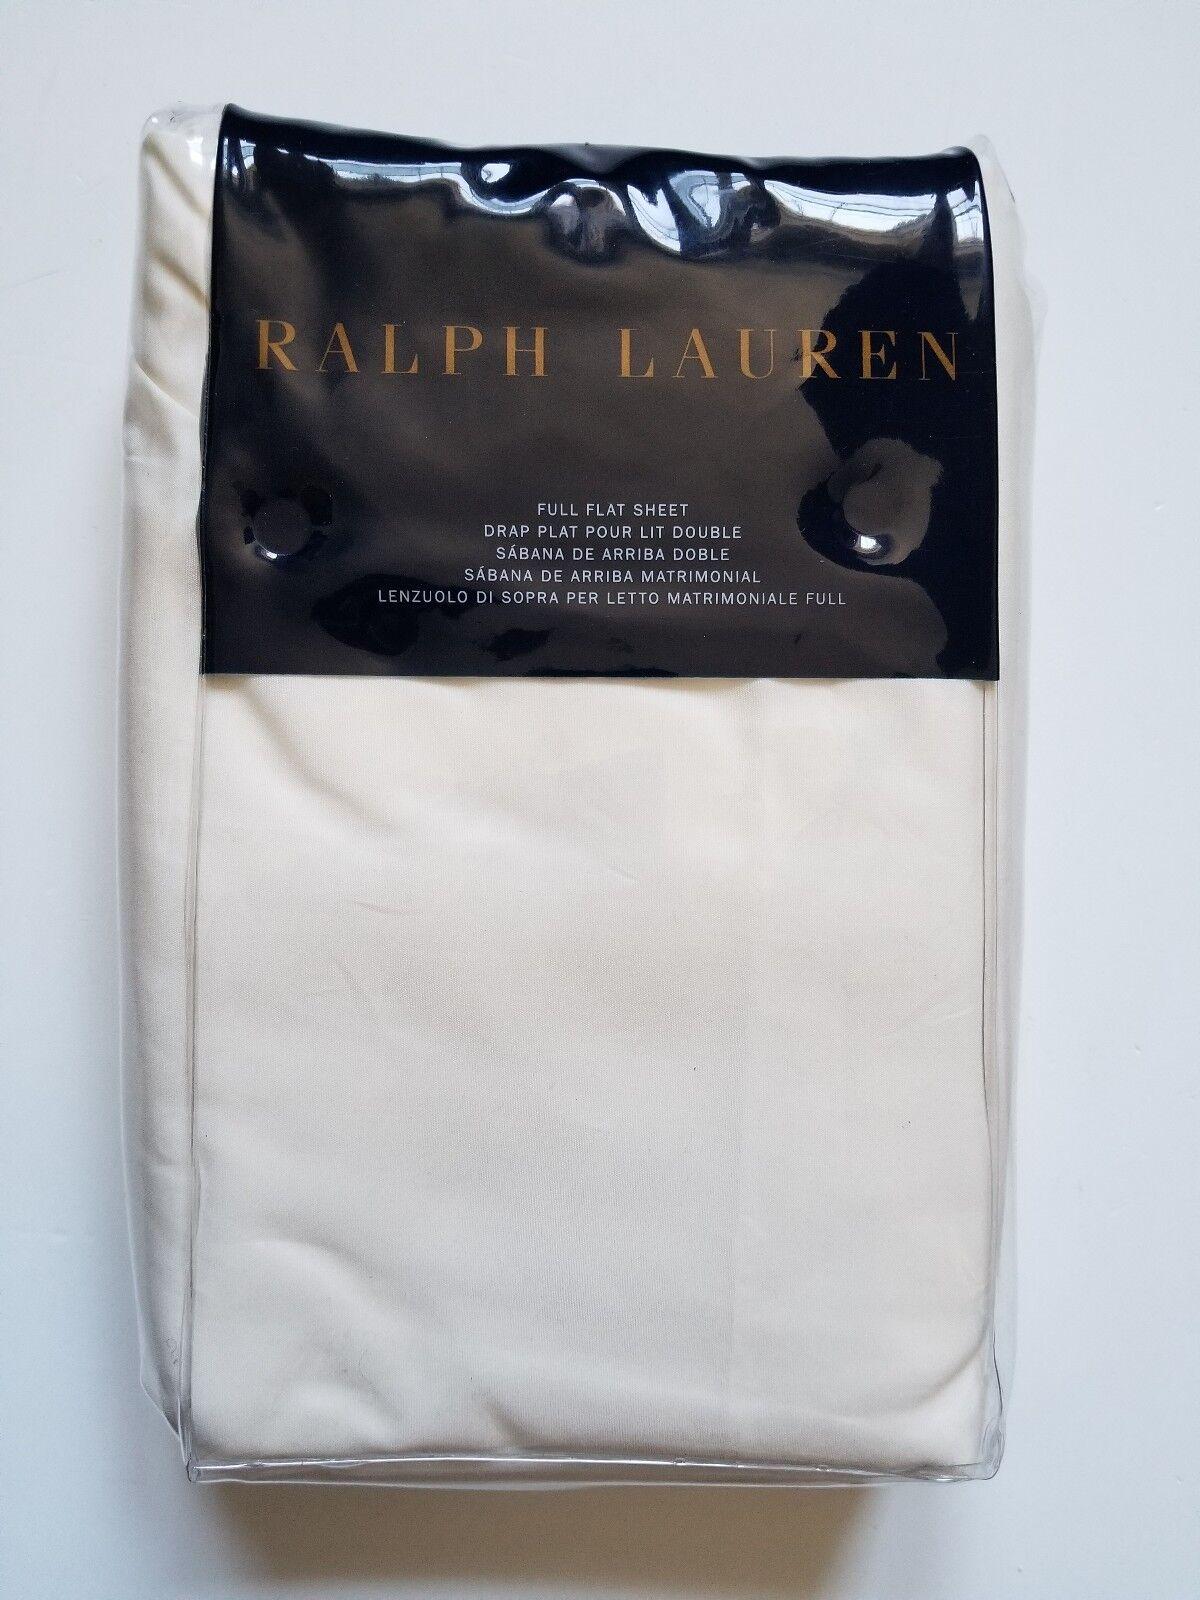 RALPH LAUREN RL-464 SOLID PERCALE VINTAGE CREAM ONE FULL FLAT SHEET